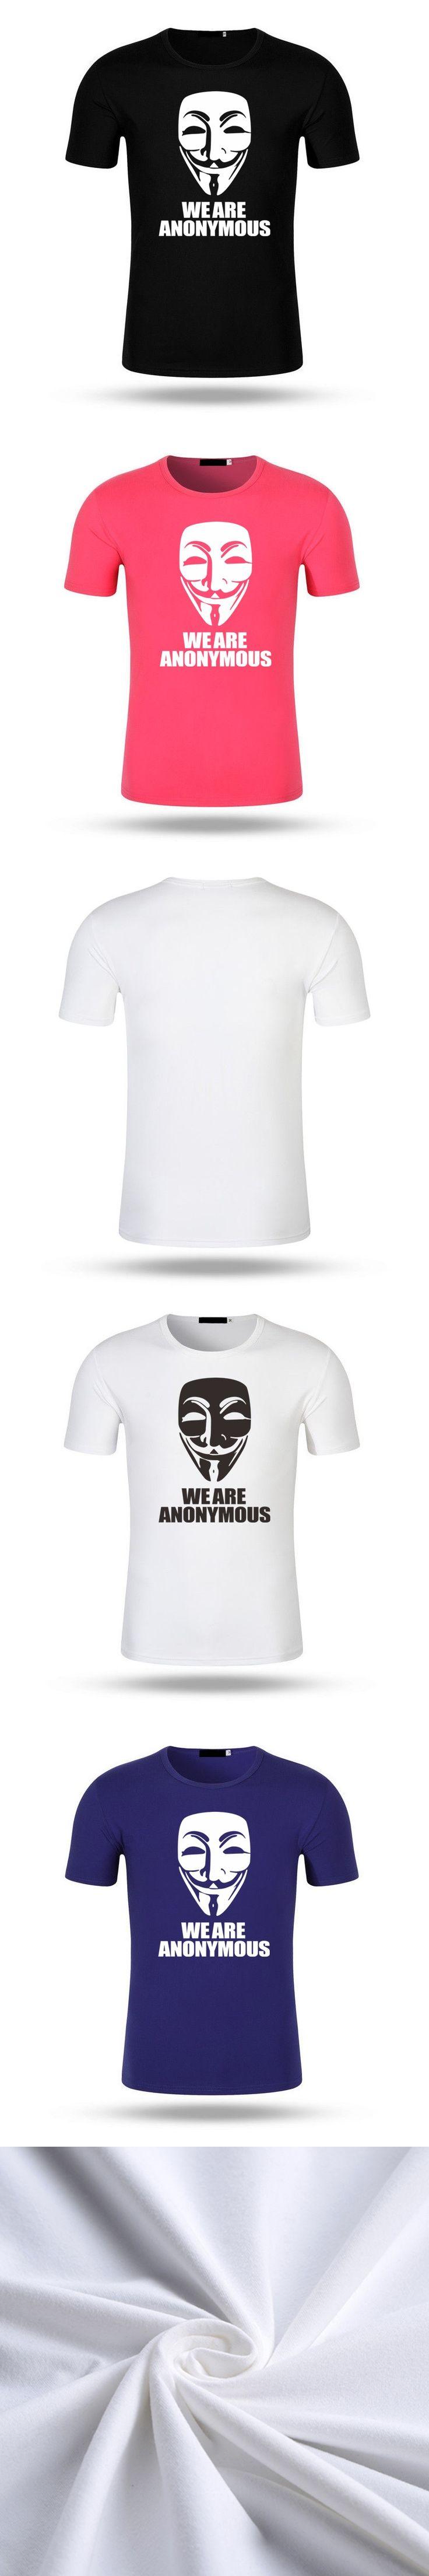 Men Fashion V for Vendetta T-Shirt Anonymous Guy Fawkes Mask Men Modal Cotton T Shirt Short Sleeve Tops Tees Tshirt